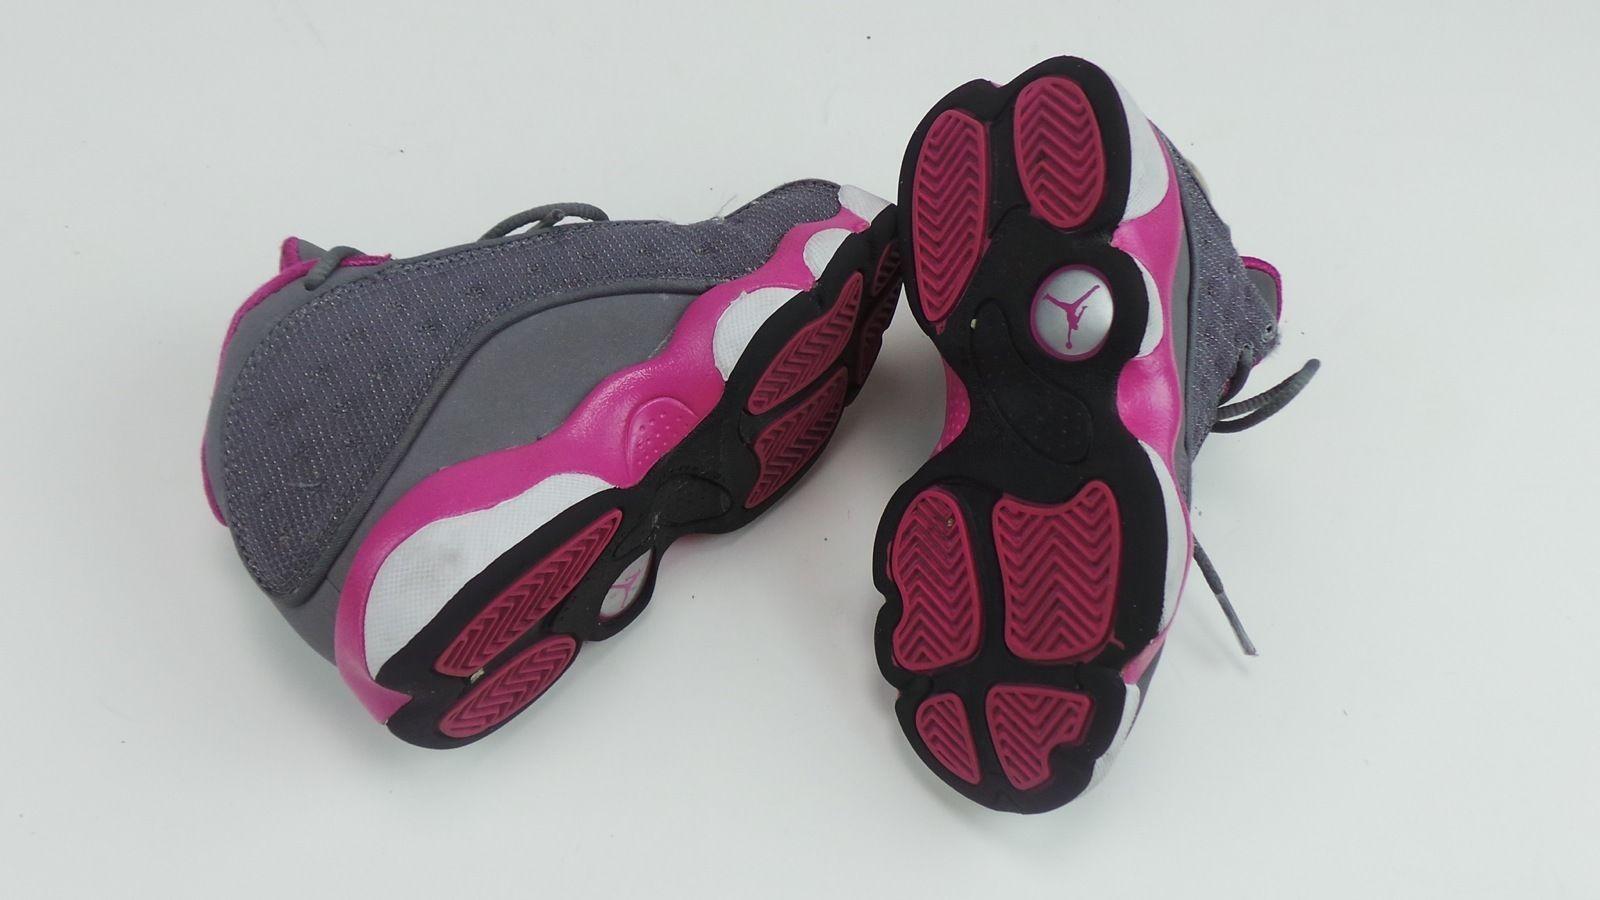 00d49cdf998db7 Nike Air Jordan 13 GS Girls Grey Pink White Jordans Retro Size 10 5 439669  029